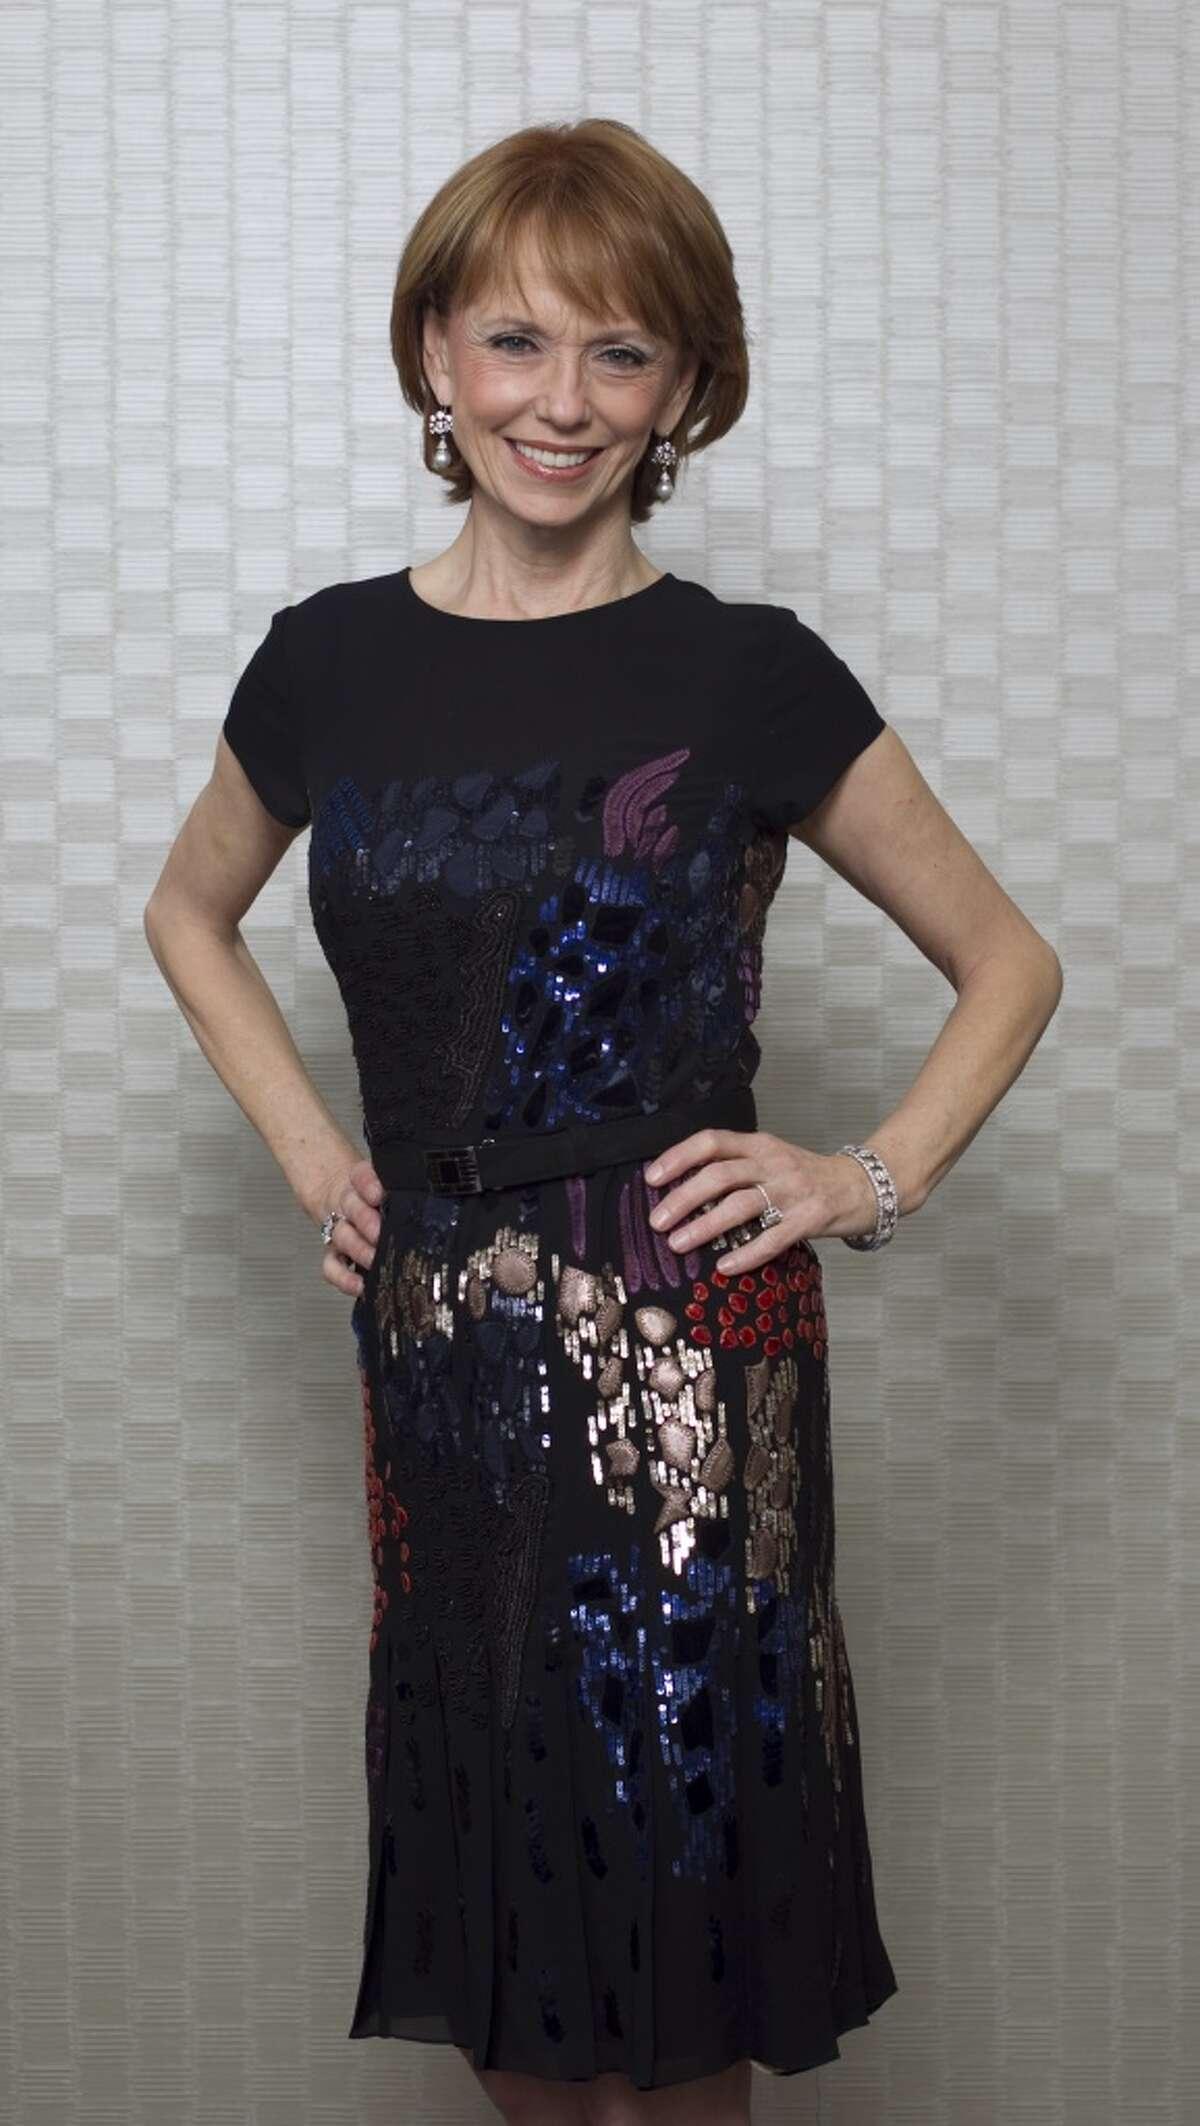 Susan Krohn wore Oscar de la Renta at the Best Dressed announcement party in 2011.